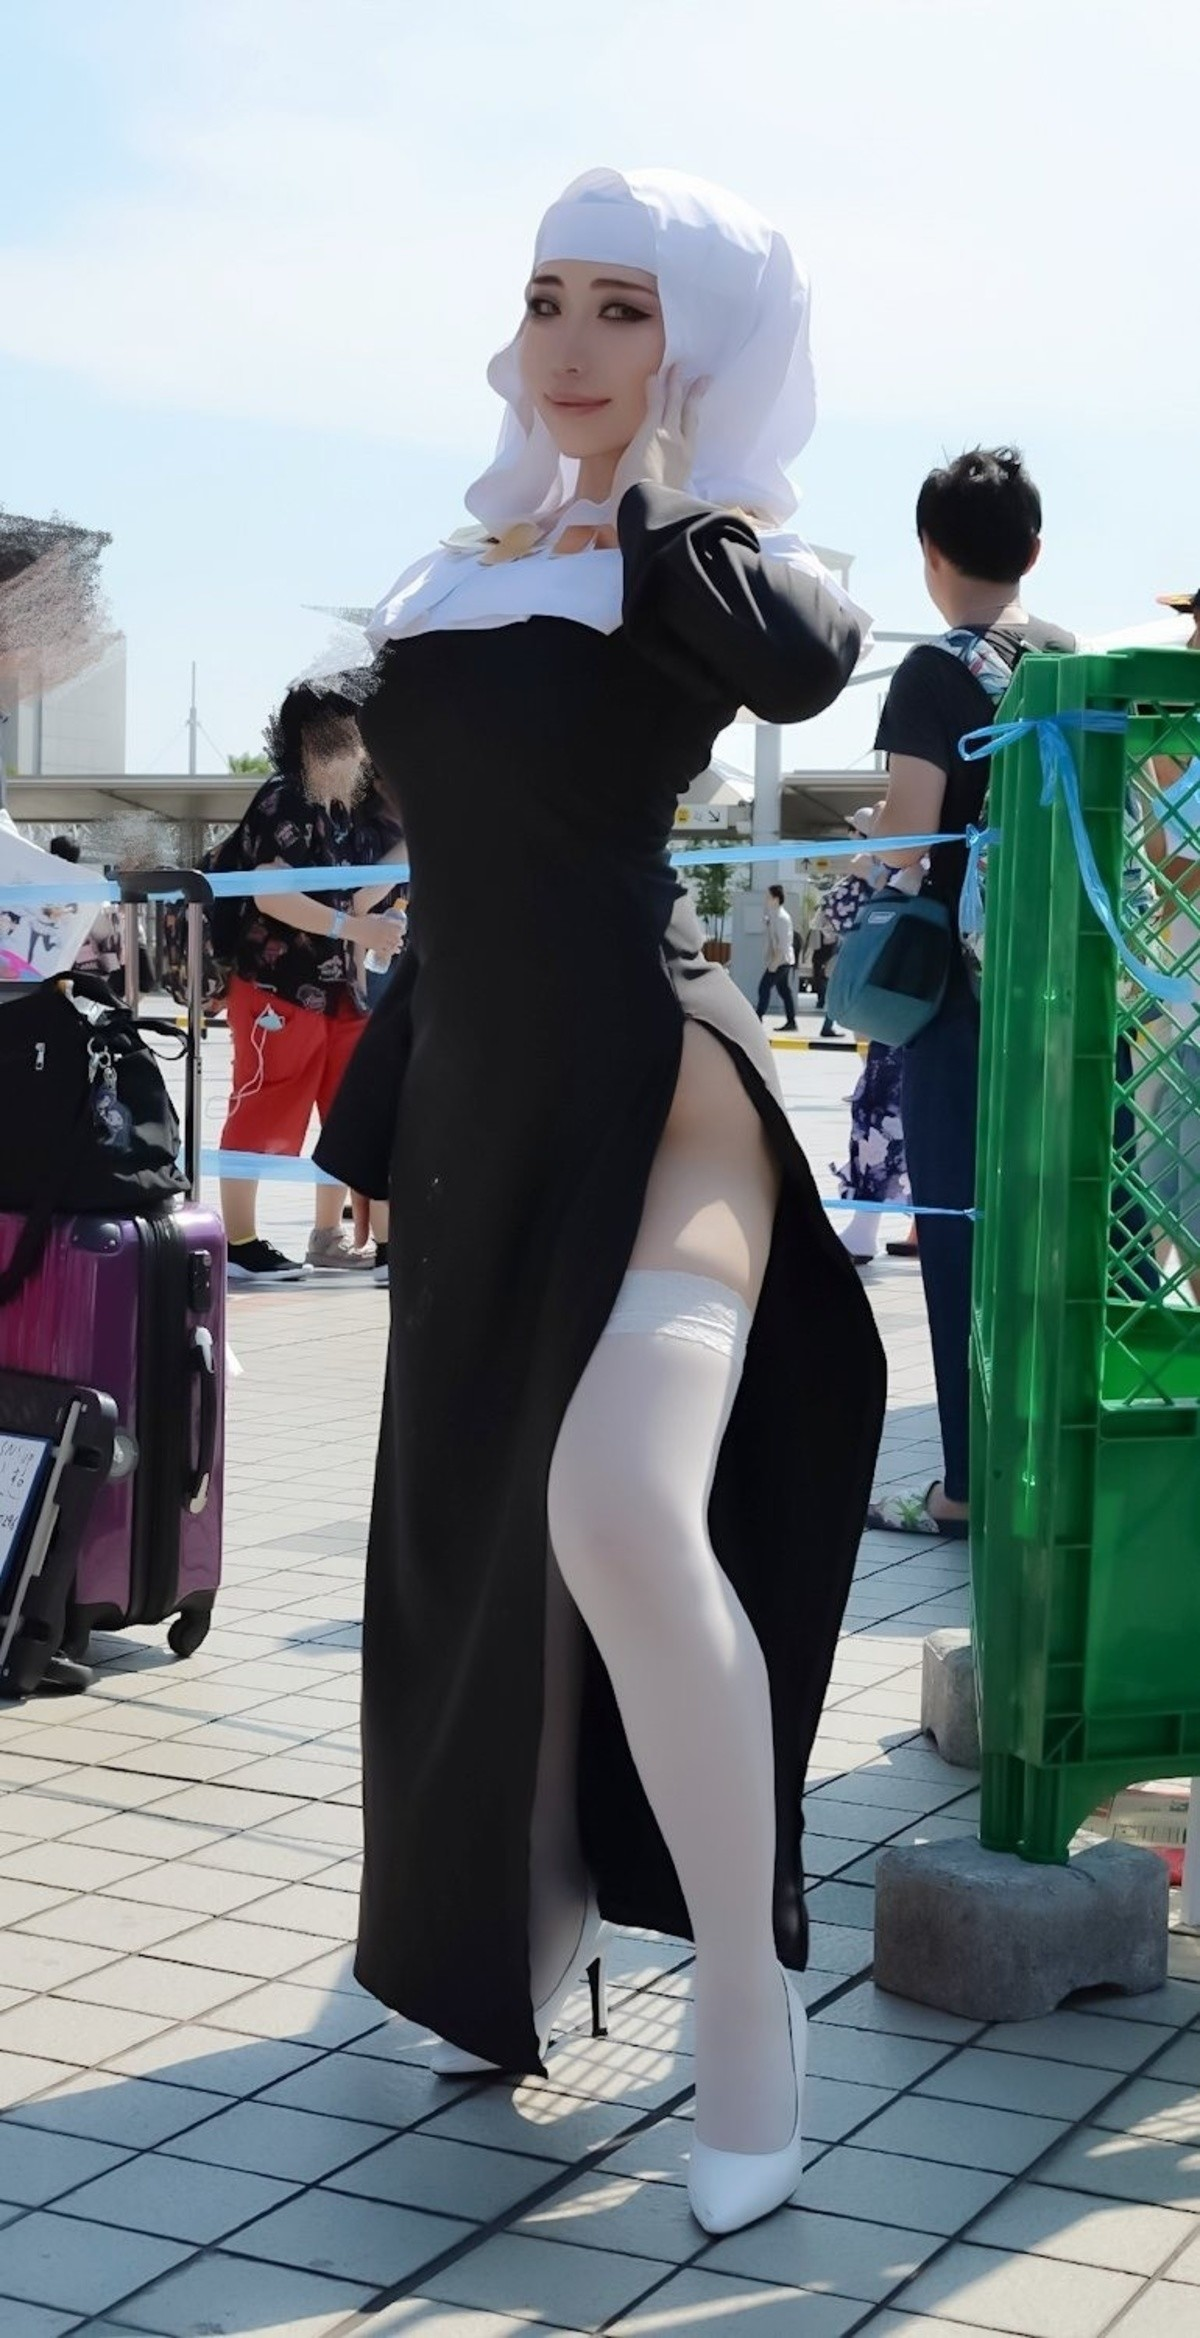 Sesshōin Kiara cosplay. .. HHHNNNGGGGGGG